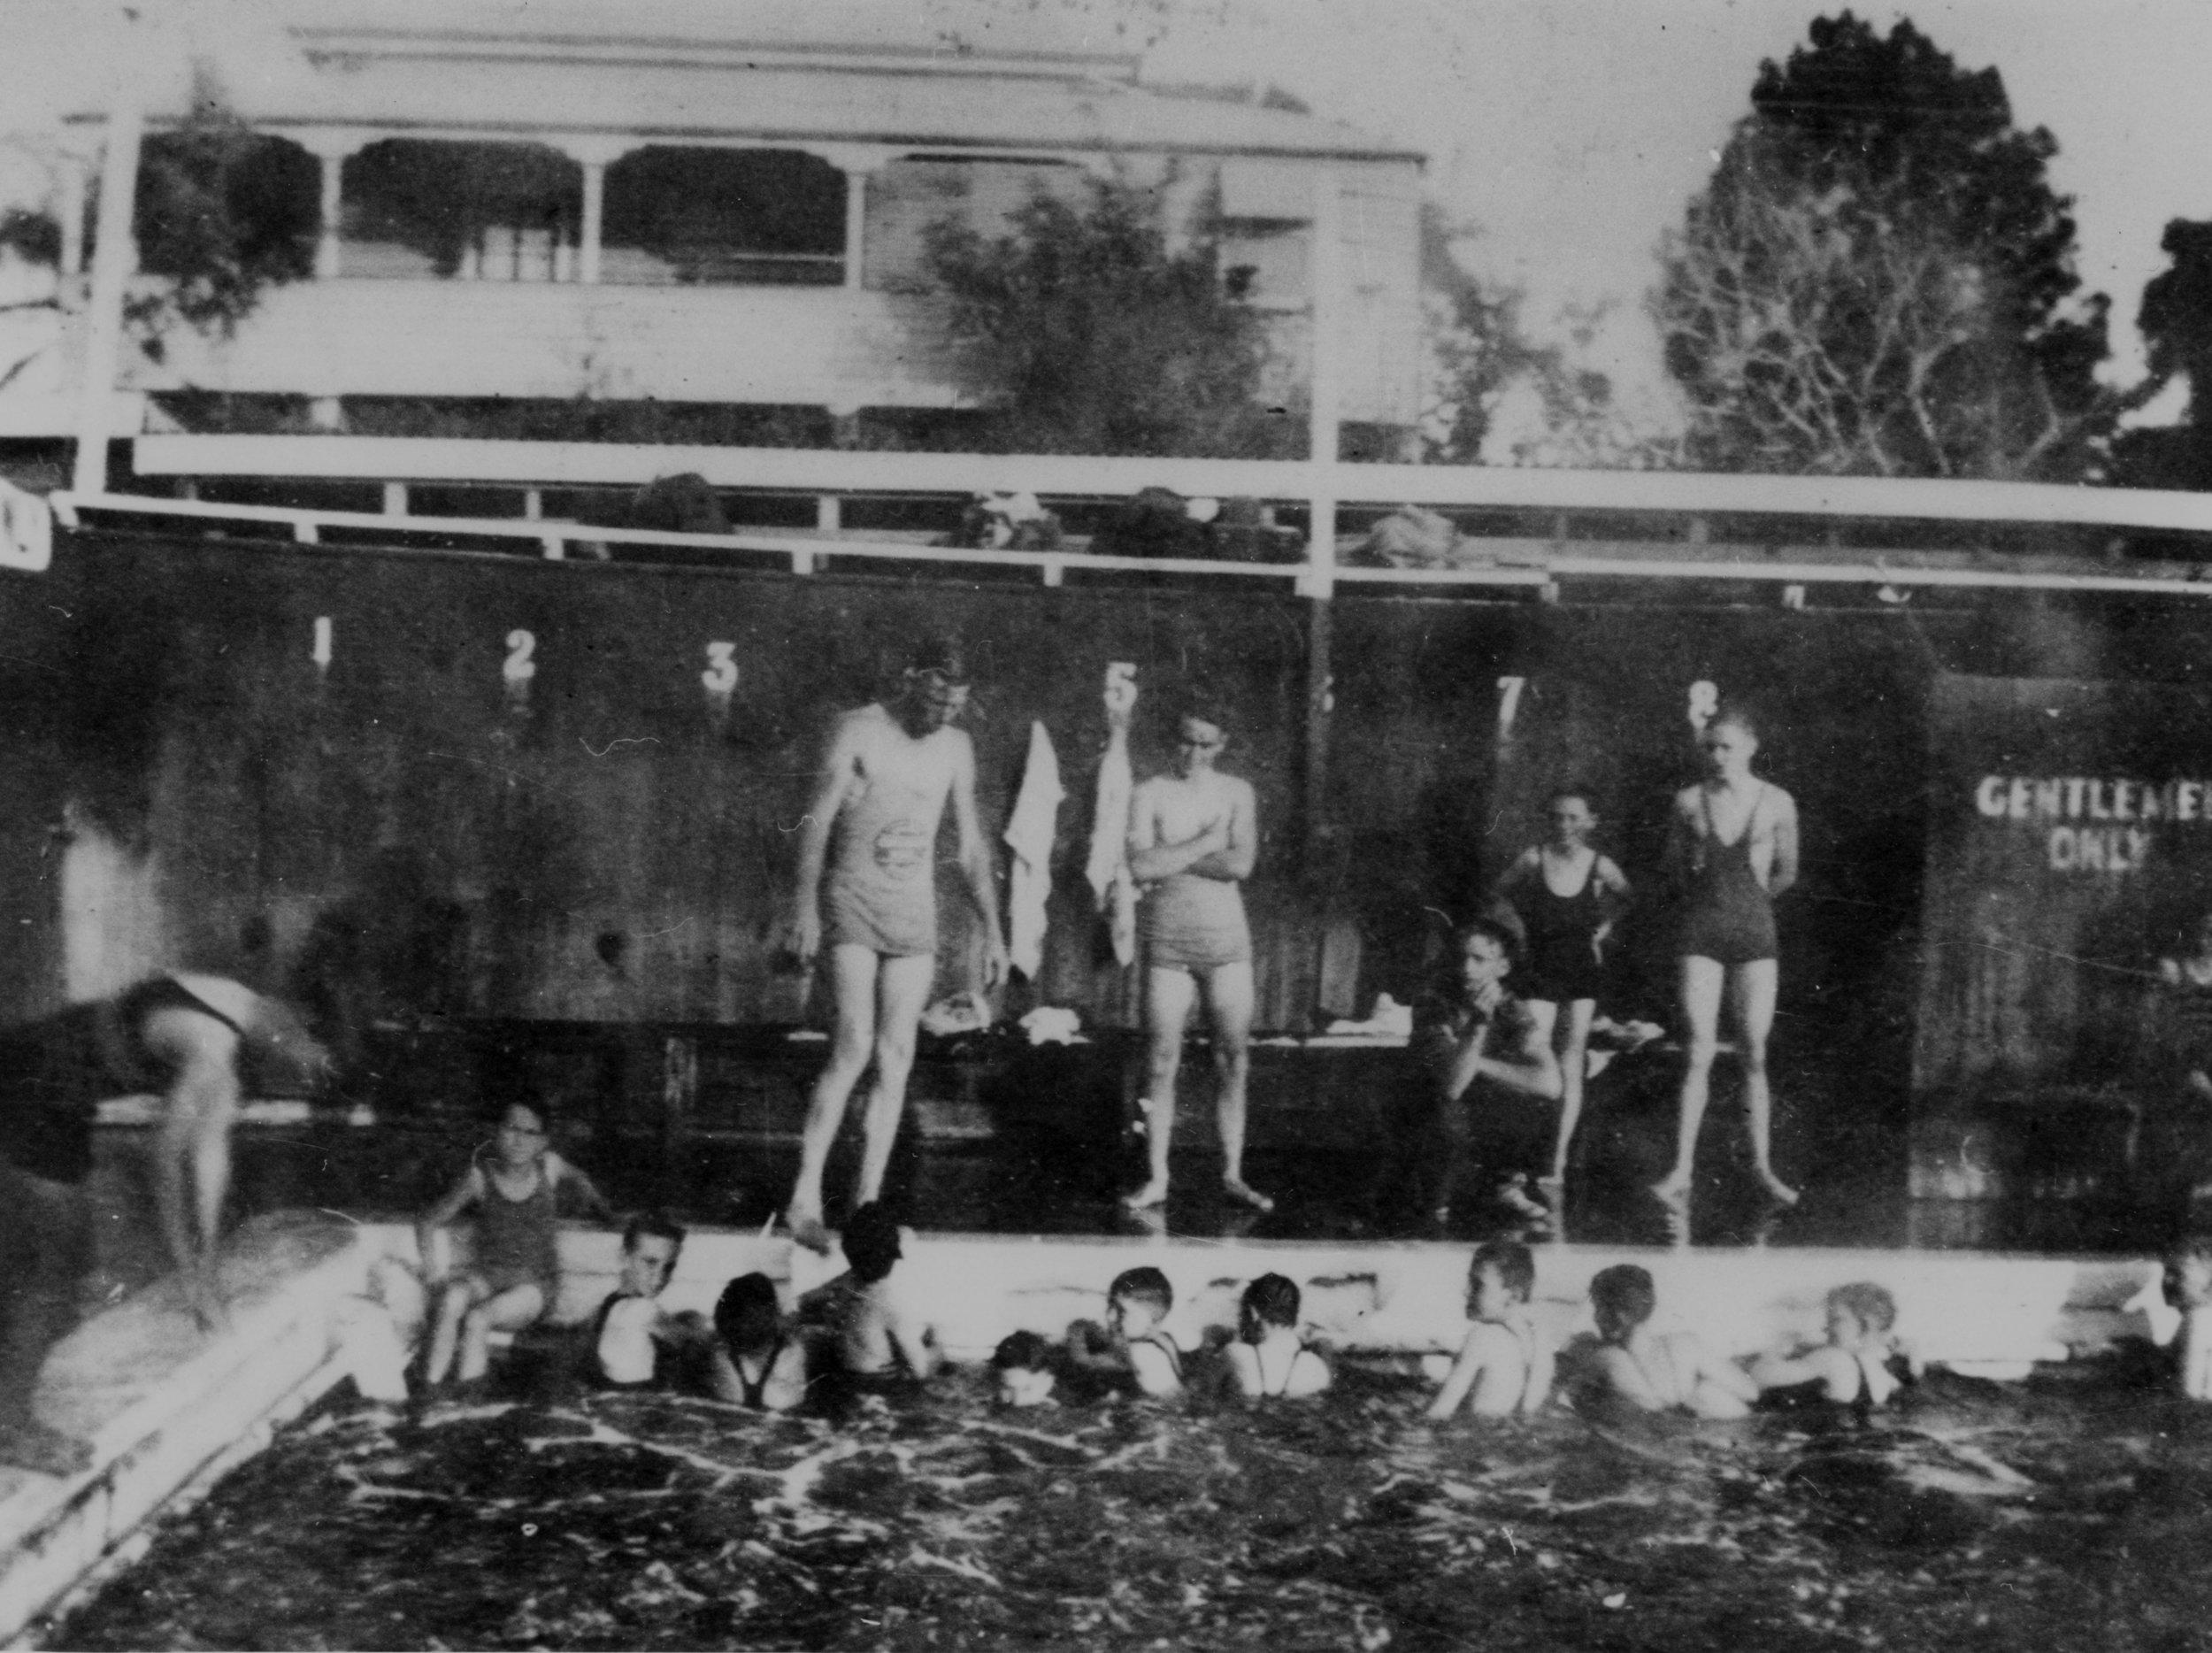 Bathers at the Davies Park Baths, photograph courtesy of the SLQ, neg no 60753